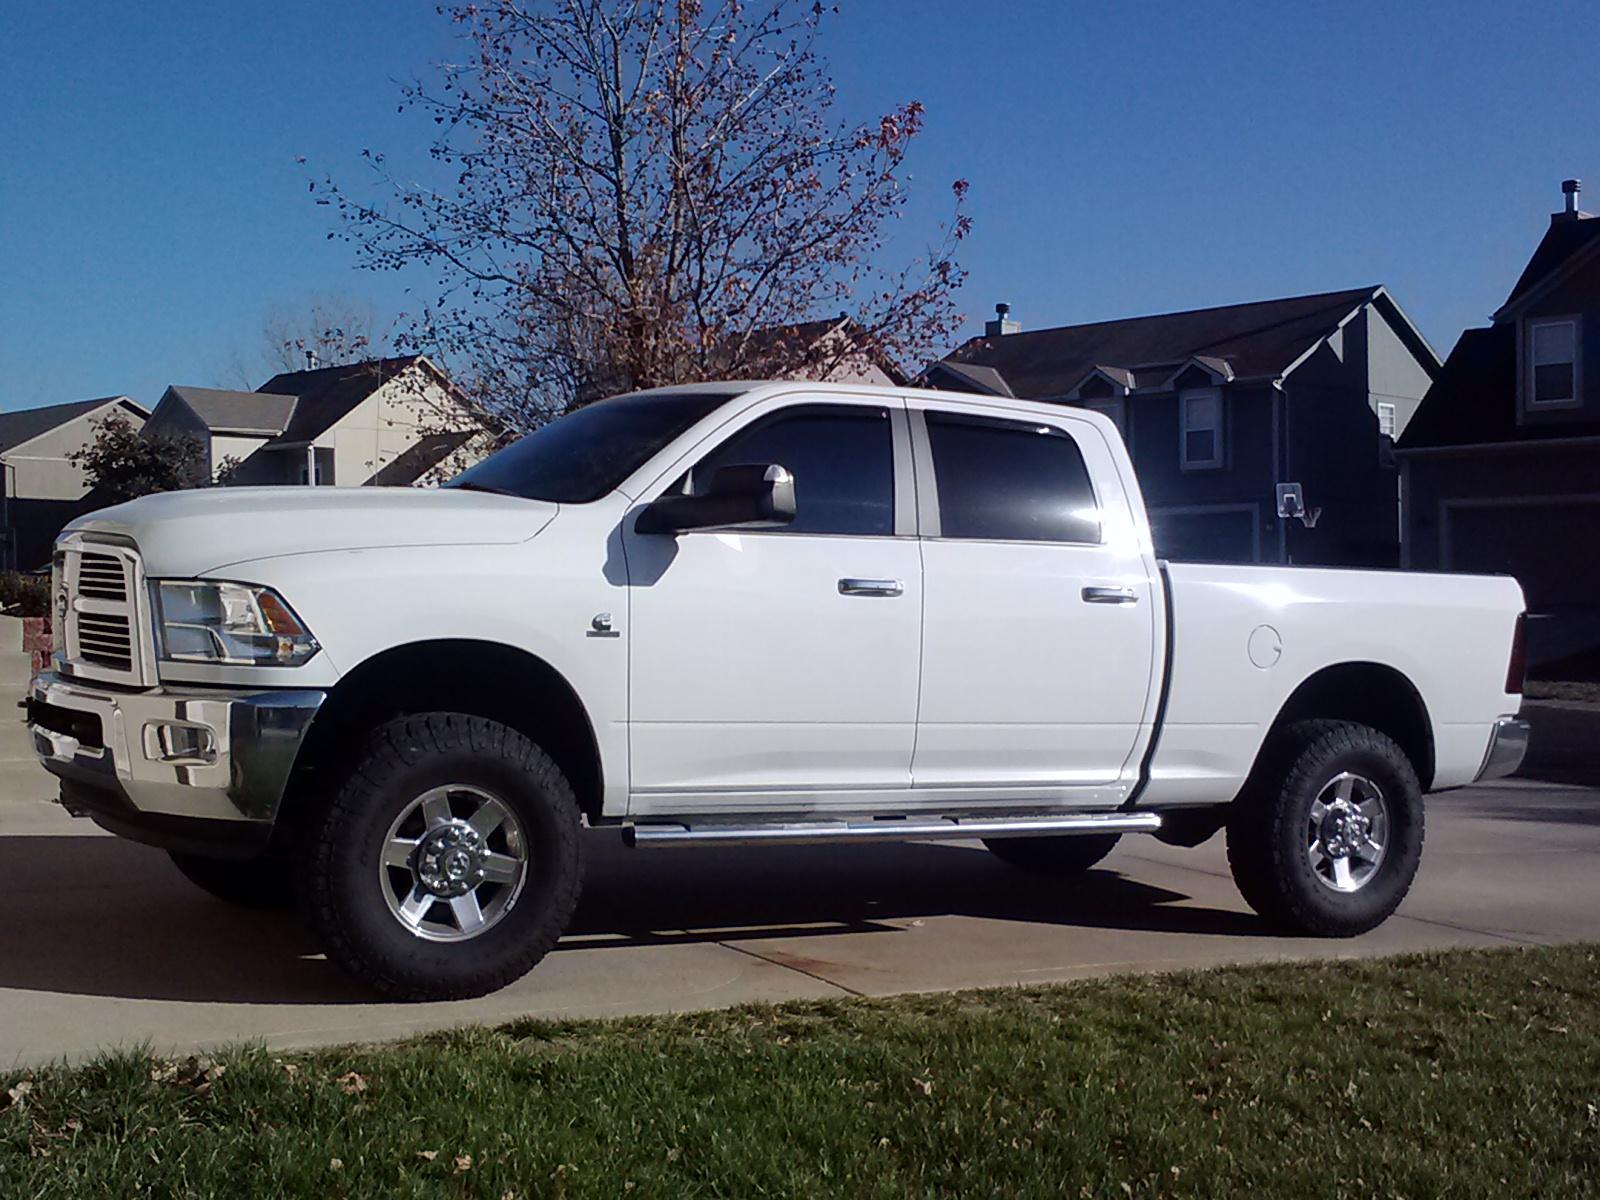 Biggest Tires On Stock Truck Dodge Cummins Diesel Forum | 2016 Car